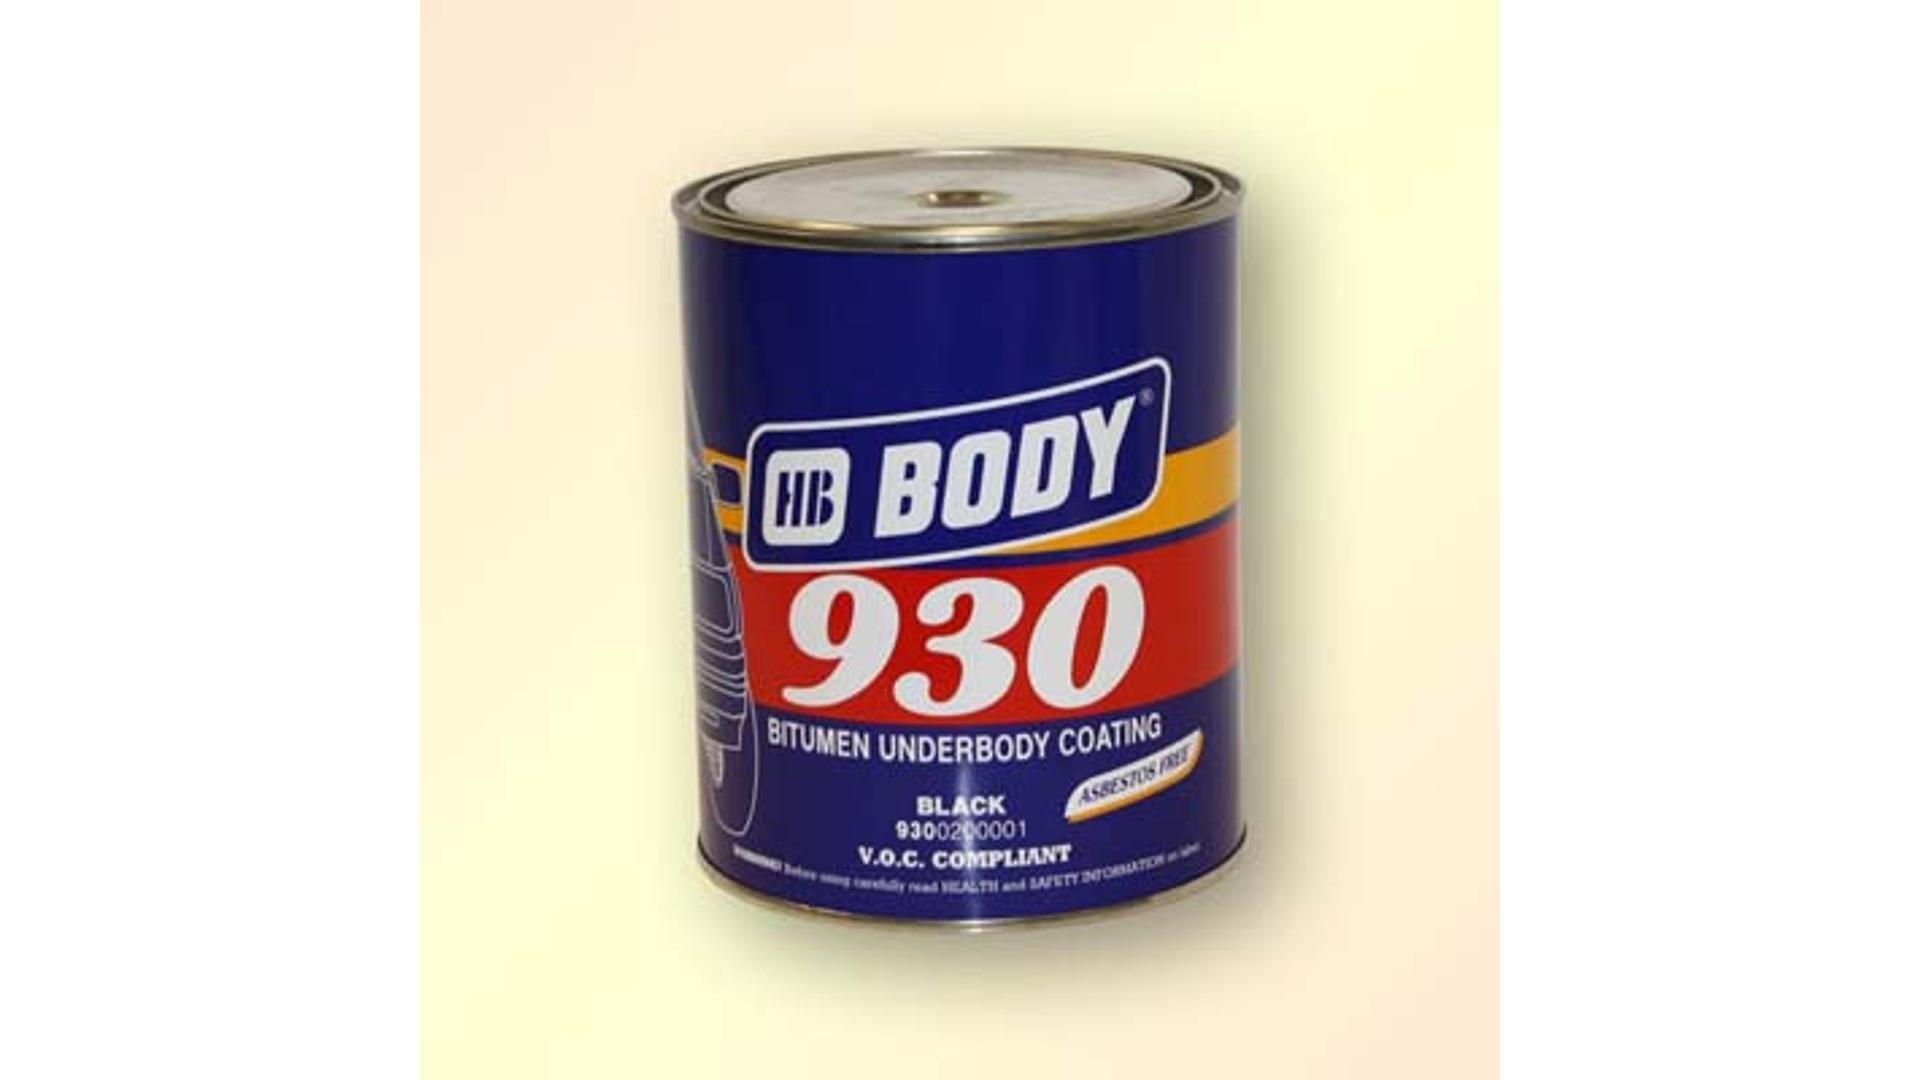 HB BODY 930 2,5KG